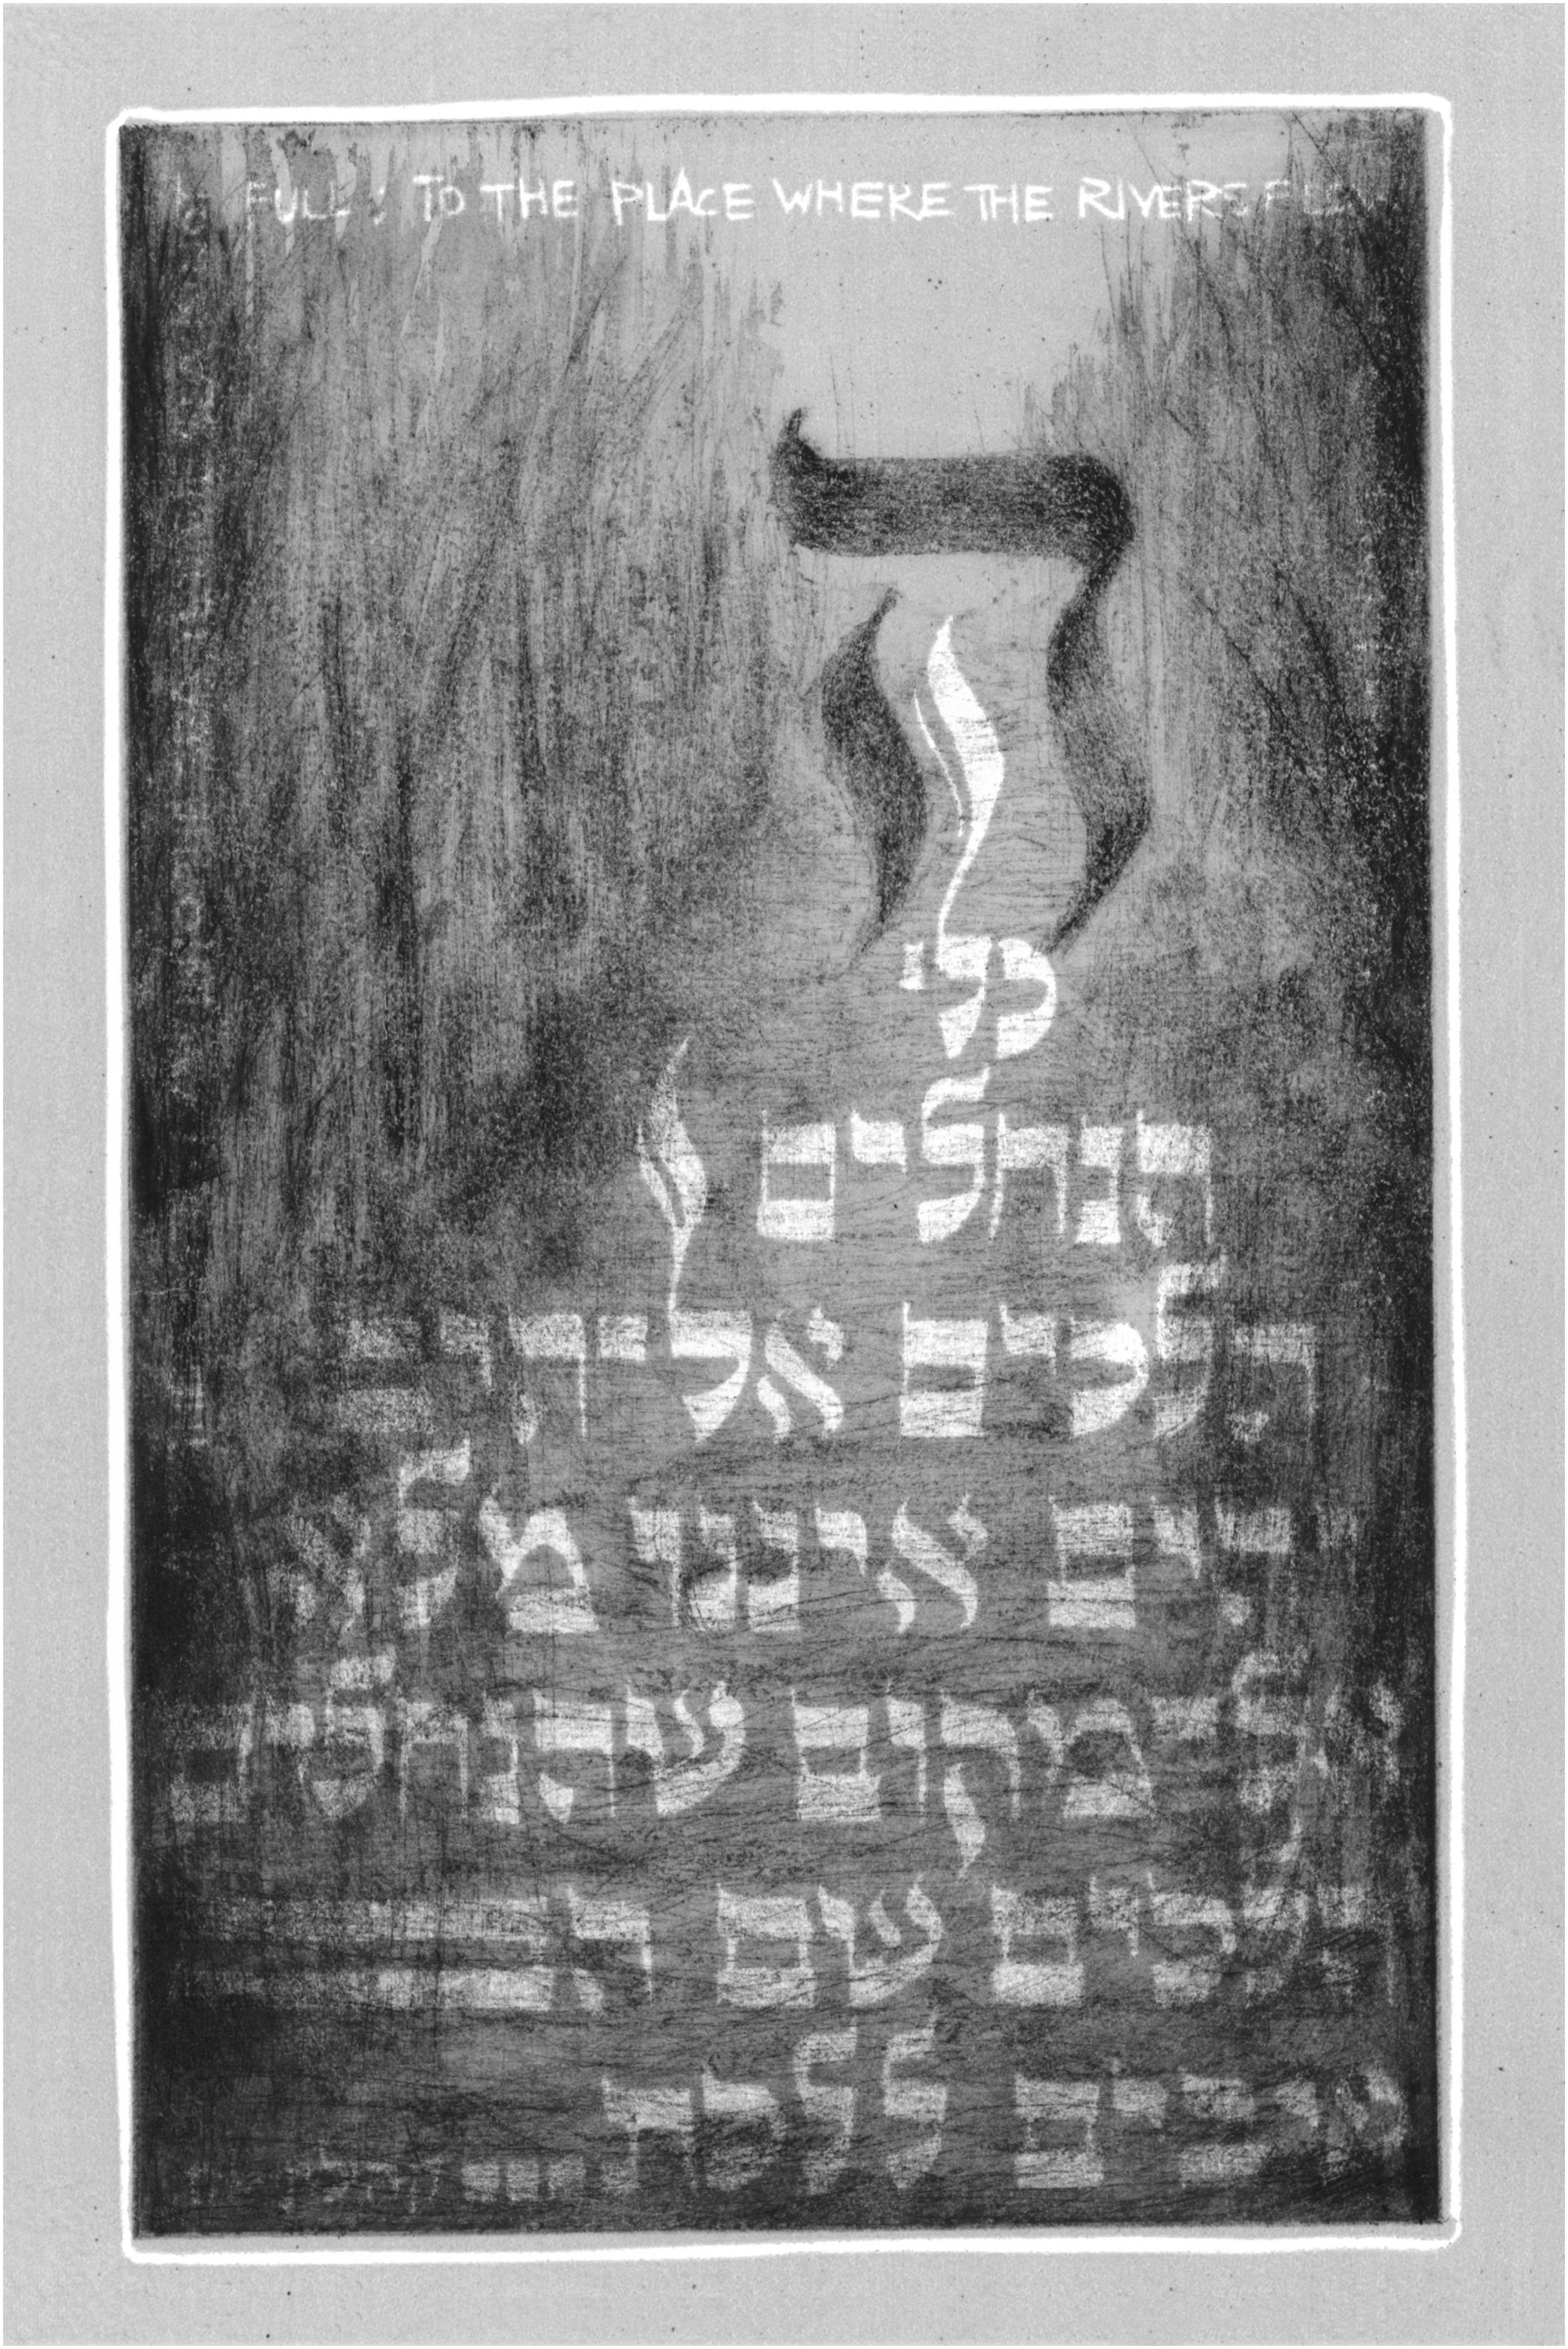 yiddish translation a penis with ears